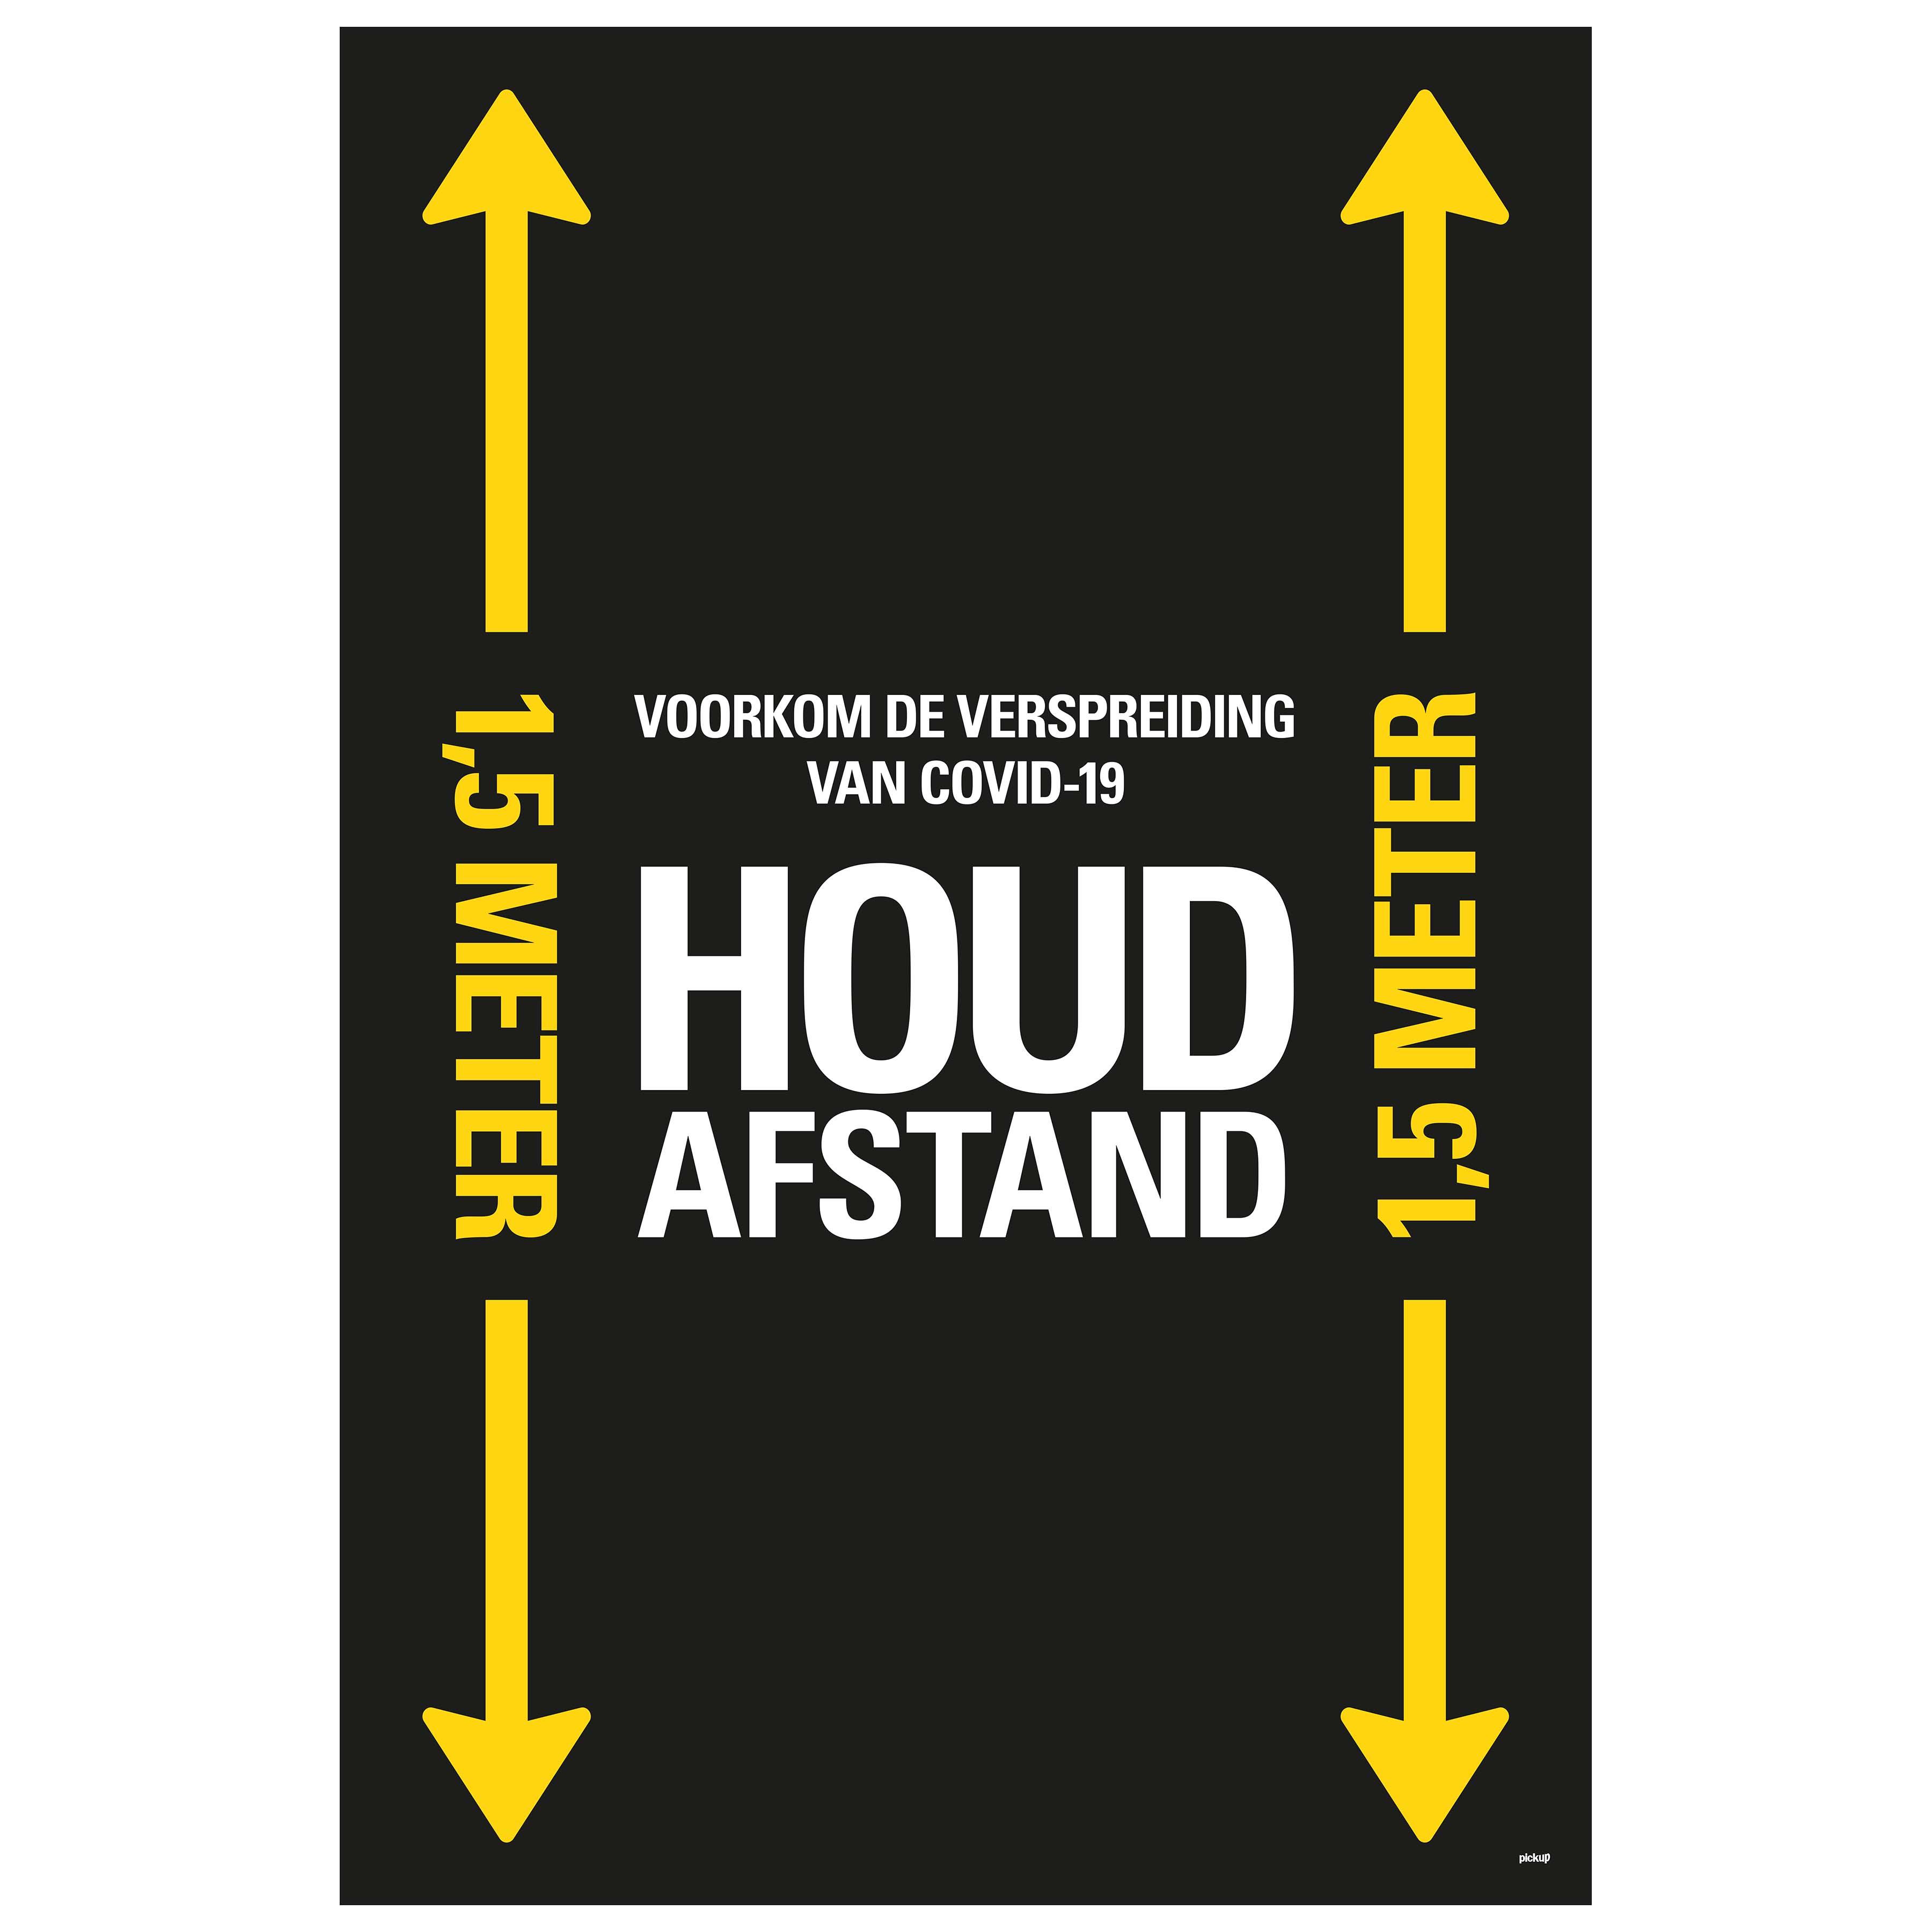 Vloersticker HOUD AFSTAND zwart-geel - social distance COVID19 COVID-19